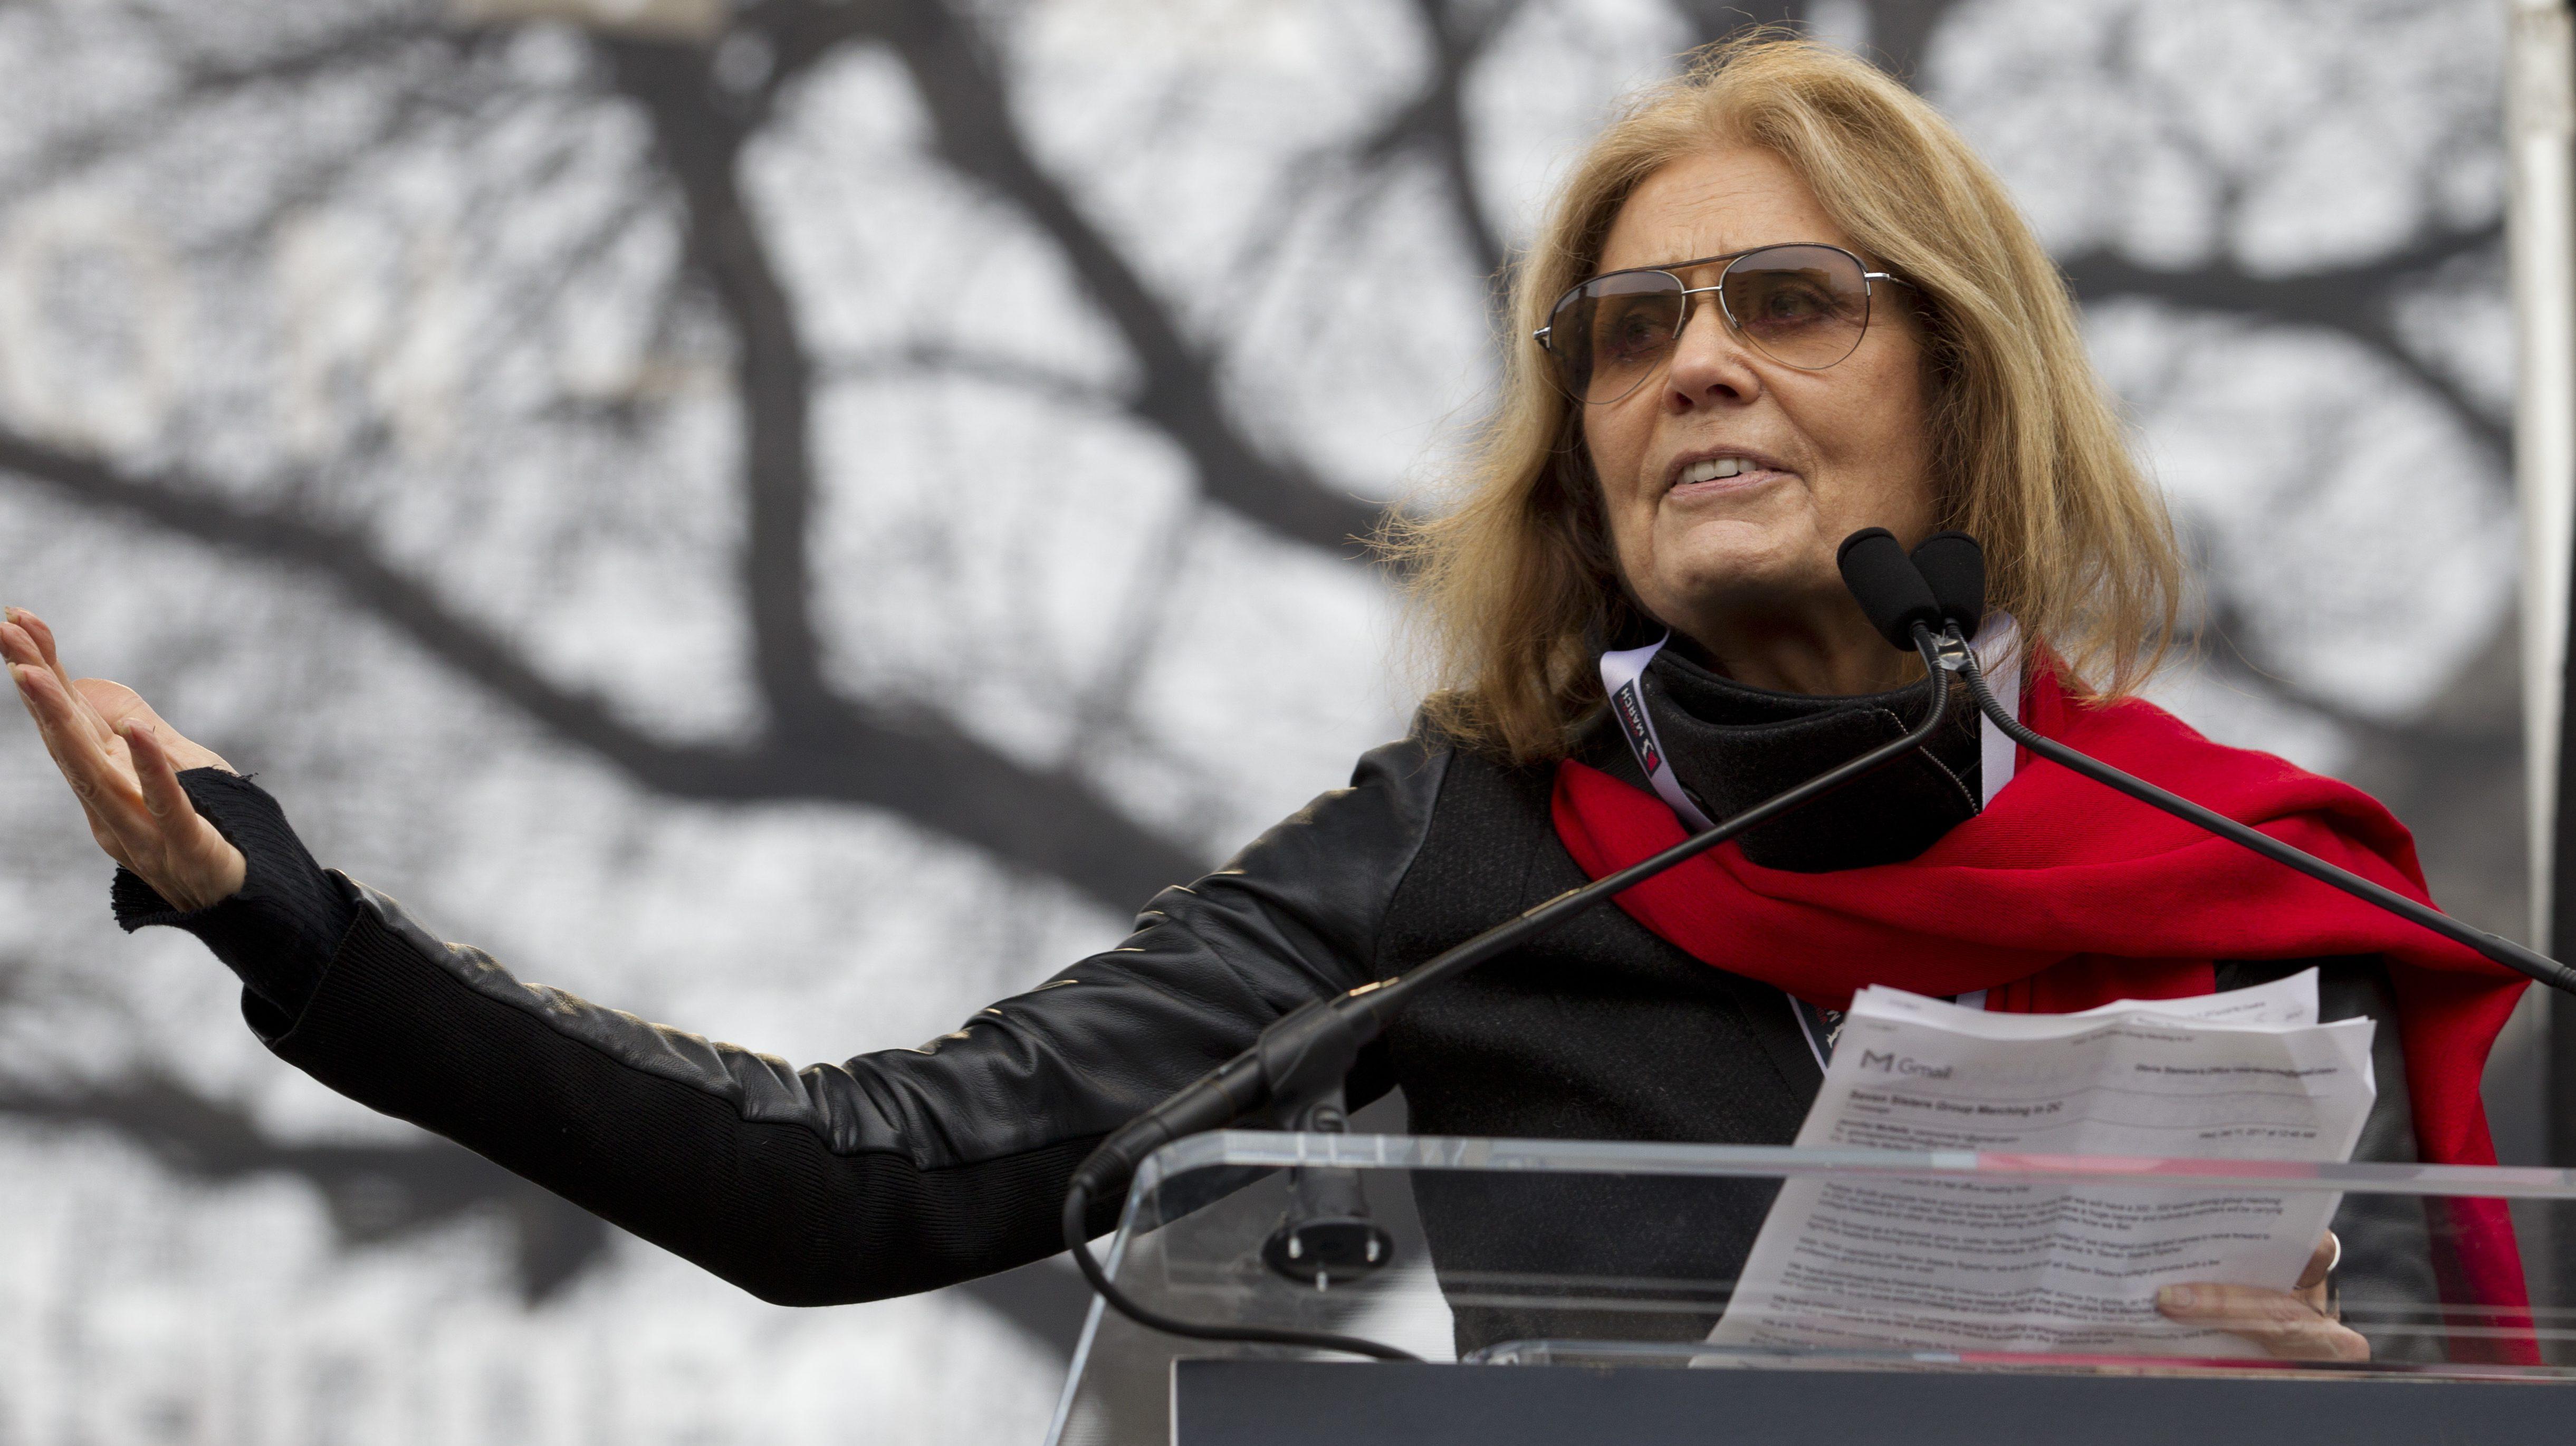 Writer and political activist Gloria Steinem speaks to the crowd during the Women's March on Washington, Saturday, Jan. 21, 2017 in Washington. (AP Photo/Jose Luis Magana)